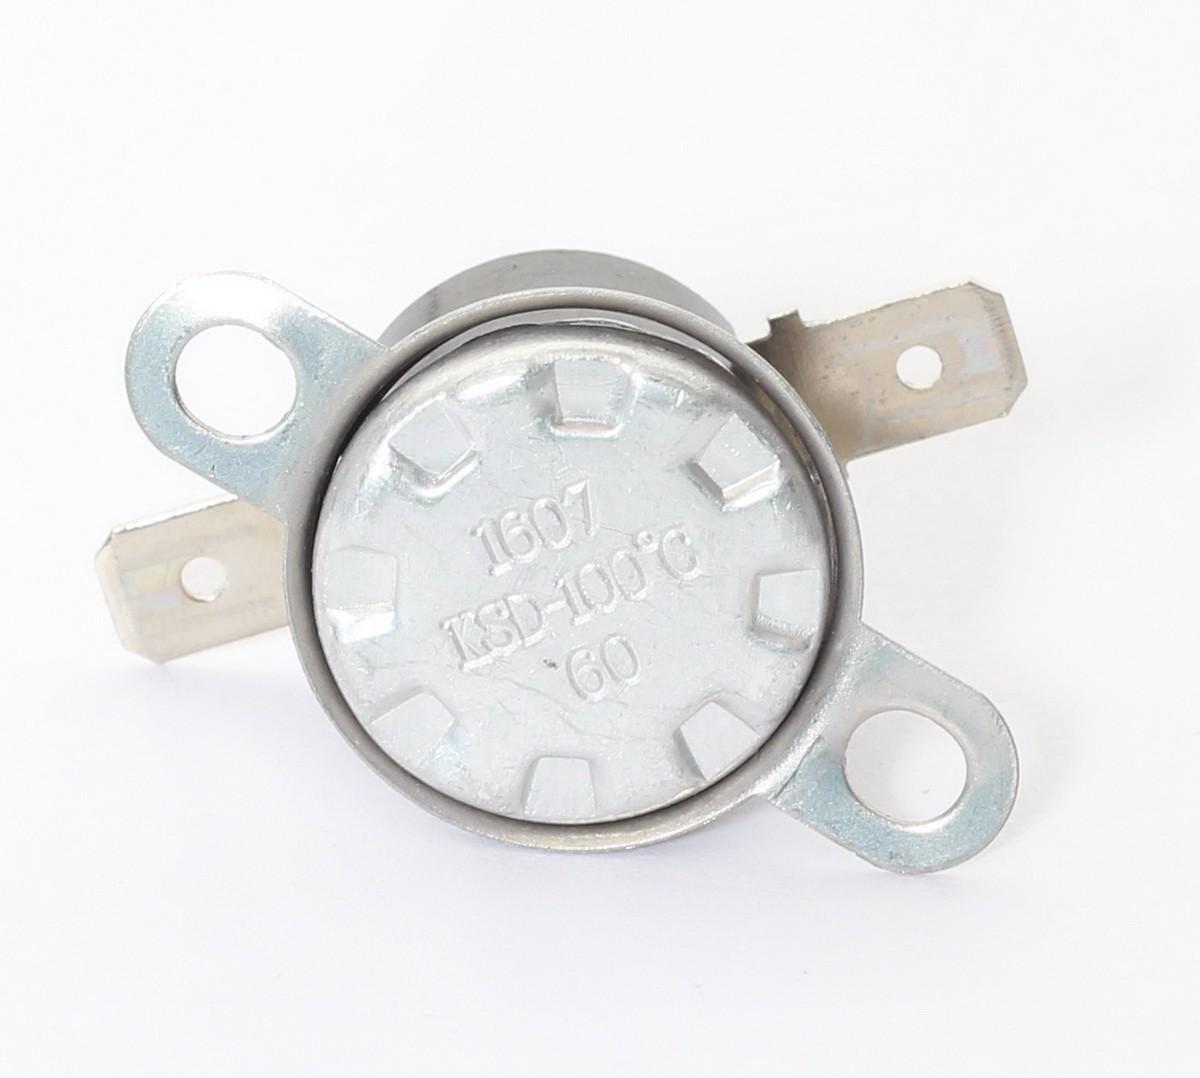 1607 KSD-100°C 60 Bimetal Thermal Fuse GE//LG//Samsung//Sharp//Panasonic Microwave